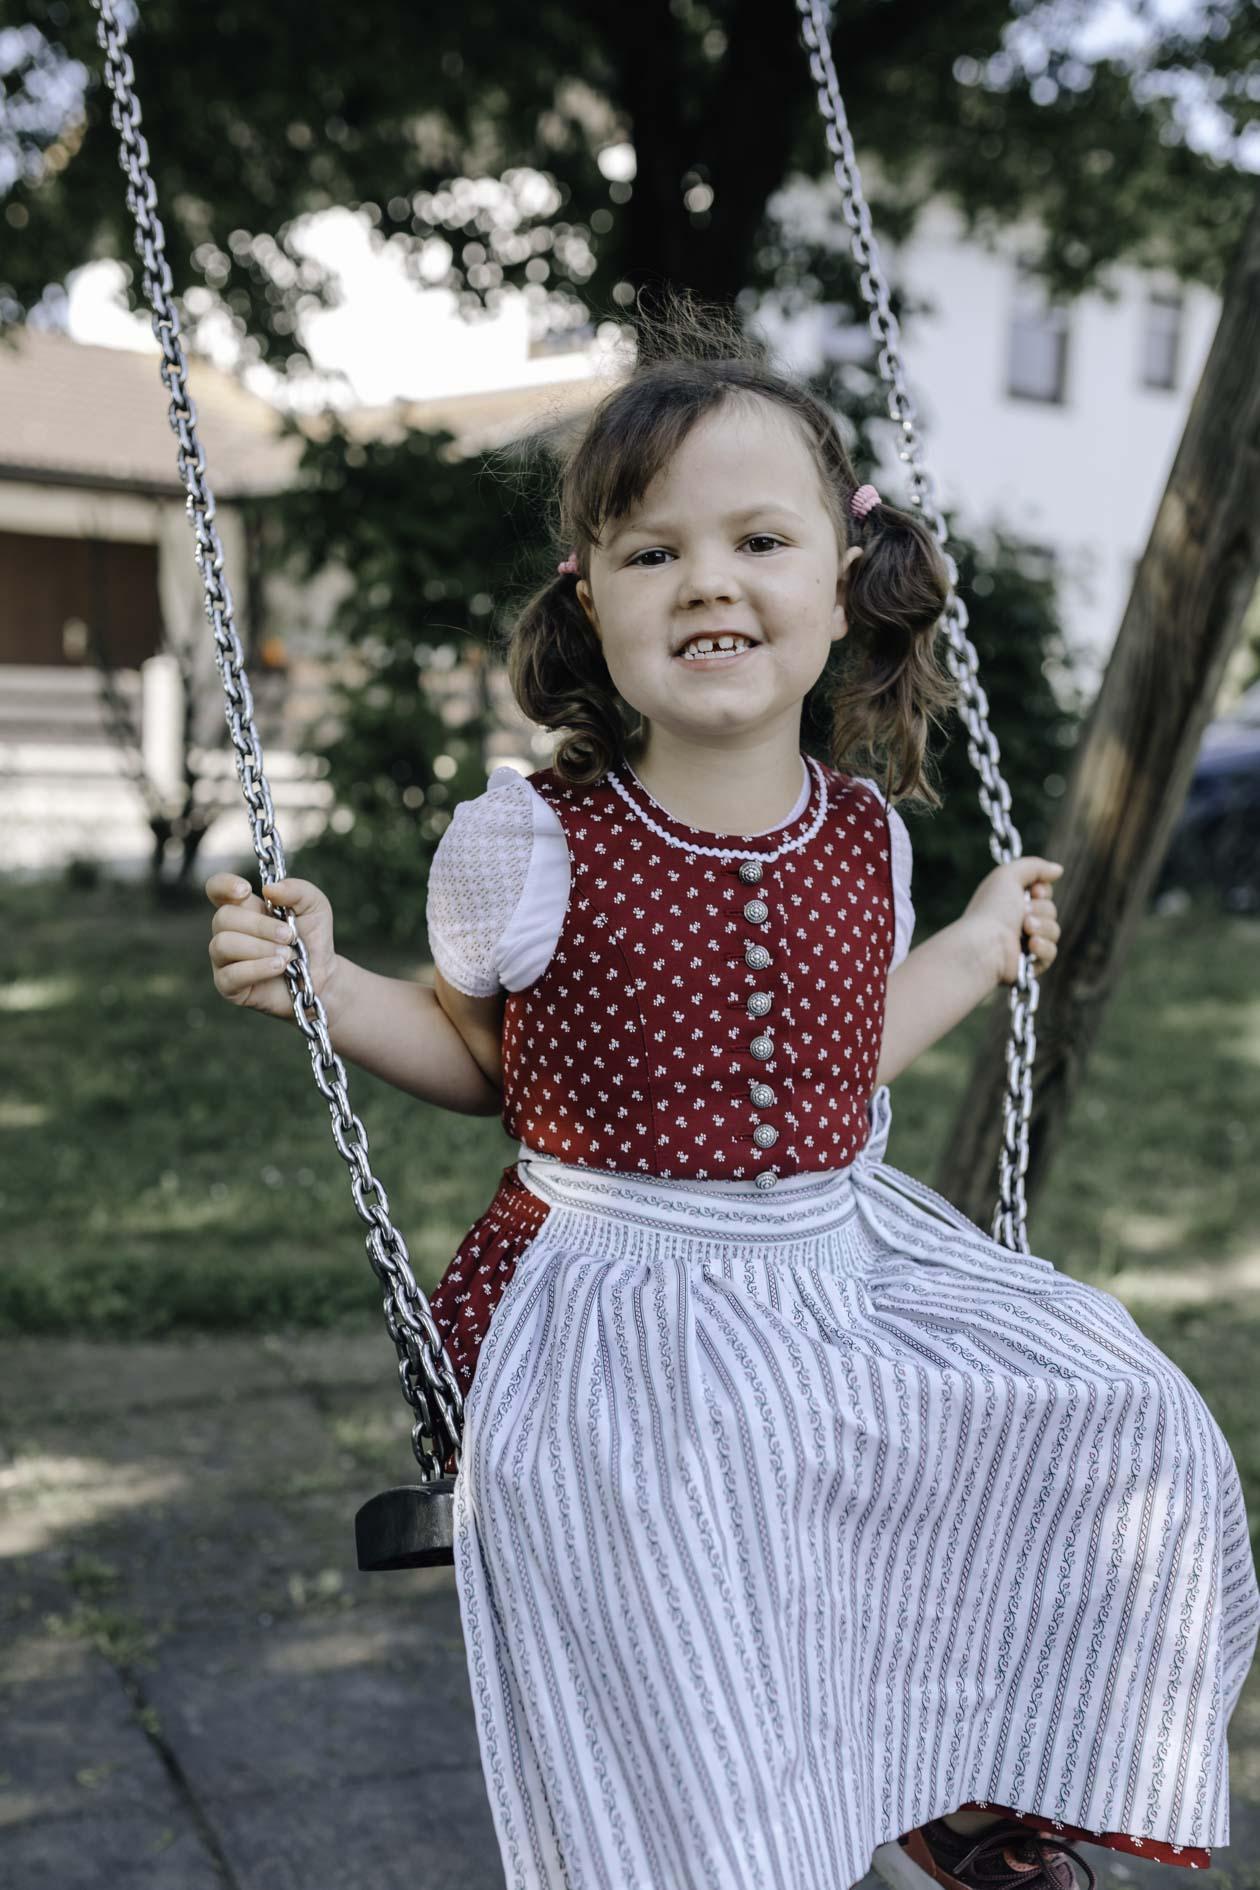 Kindergartenfotografie, das echte Leben, moderene Kitafotogafie, Simone Lerner Fotografie